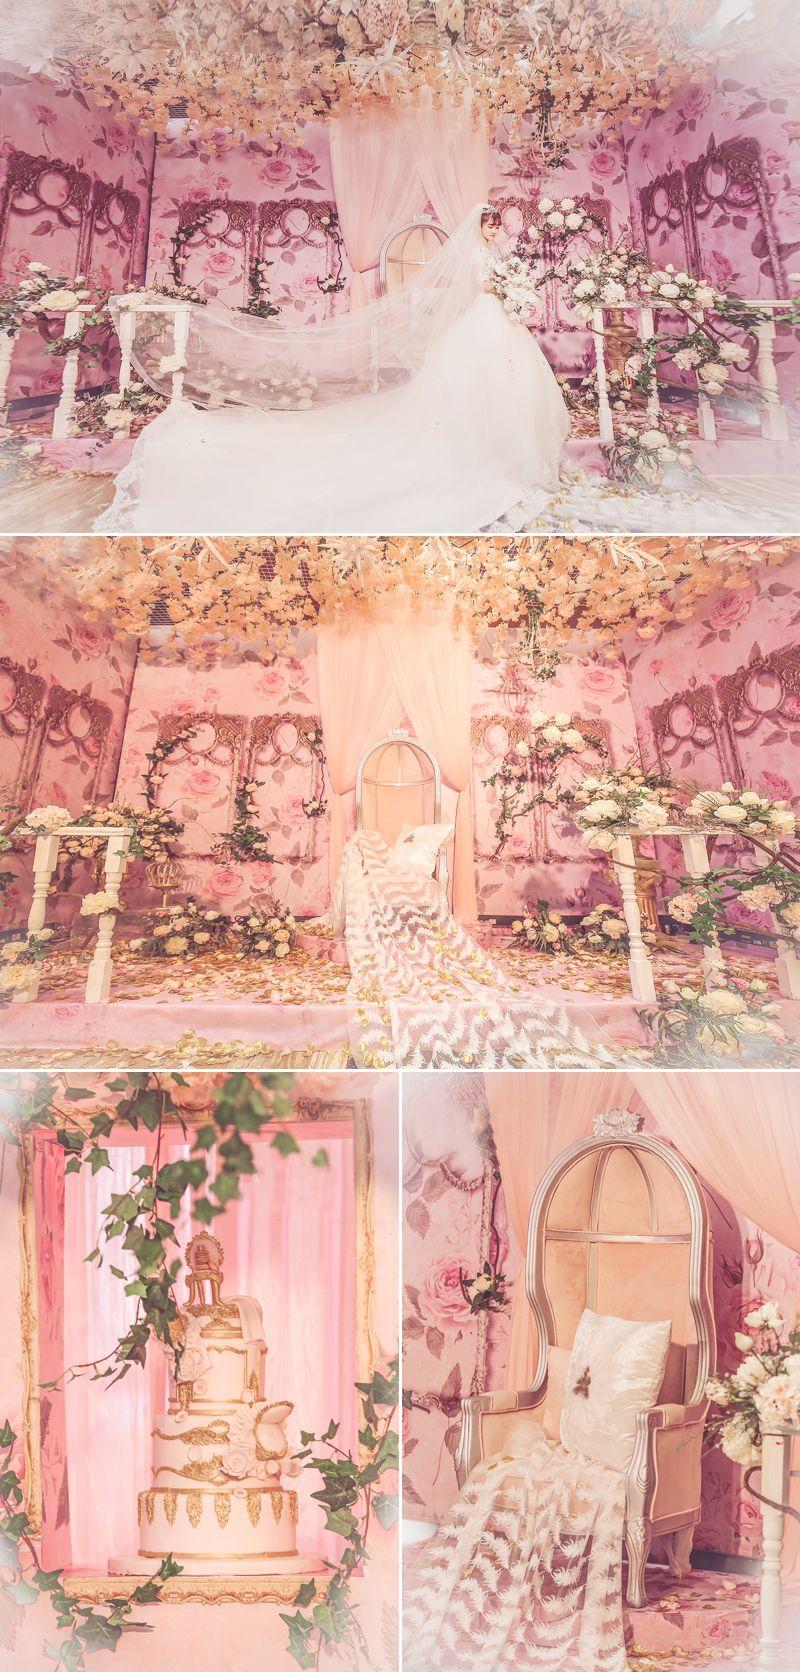 6 breathtaking fairy tale inspired indoor wedding d cor themes you rh pinterest com